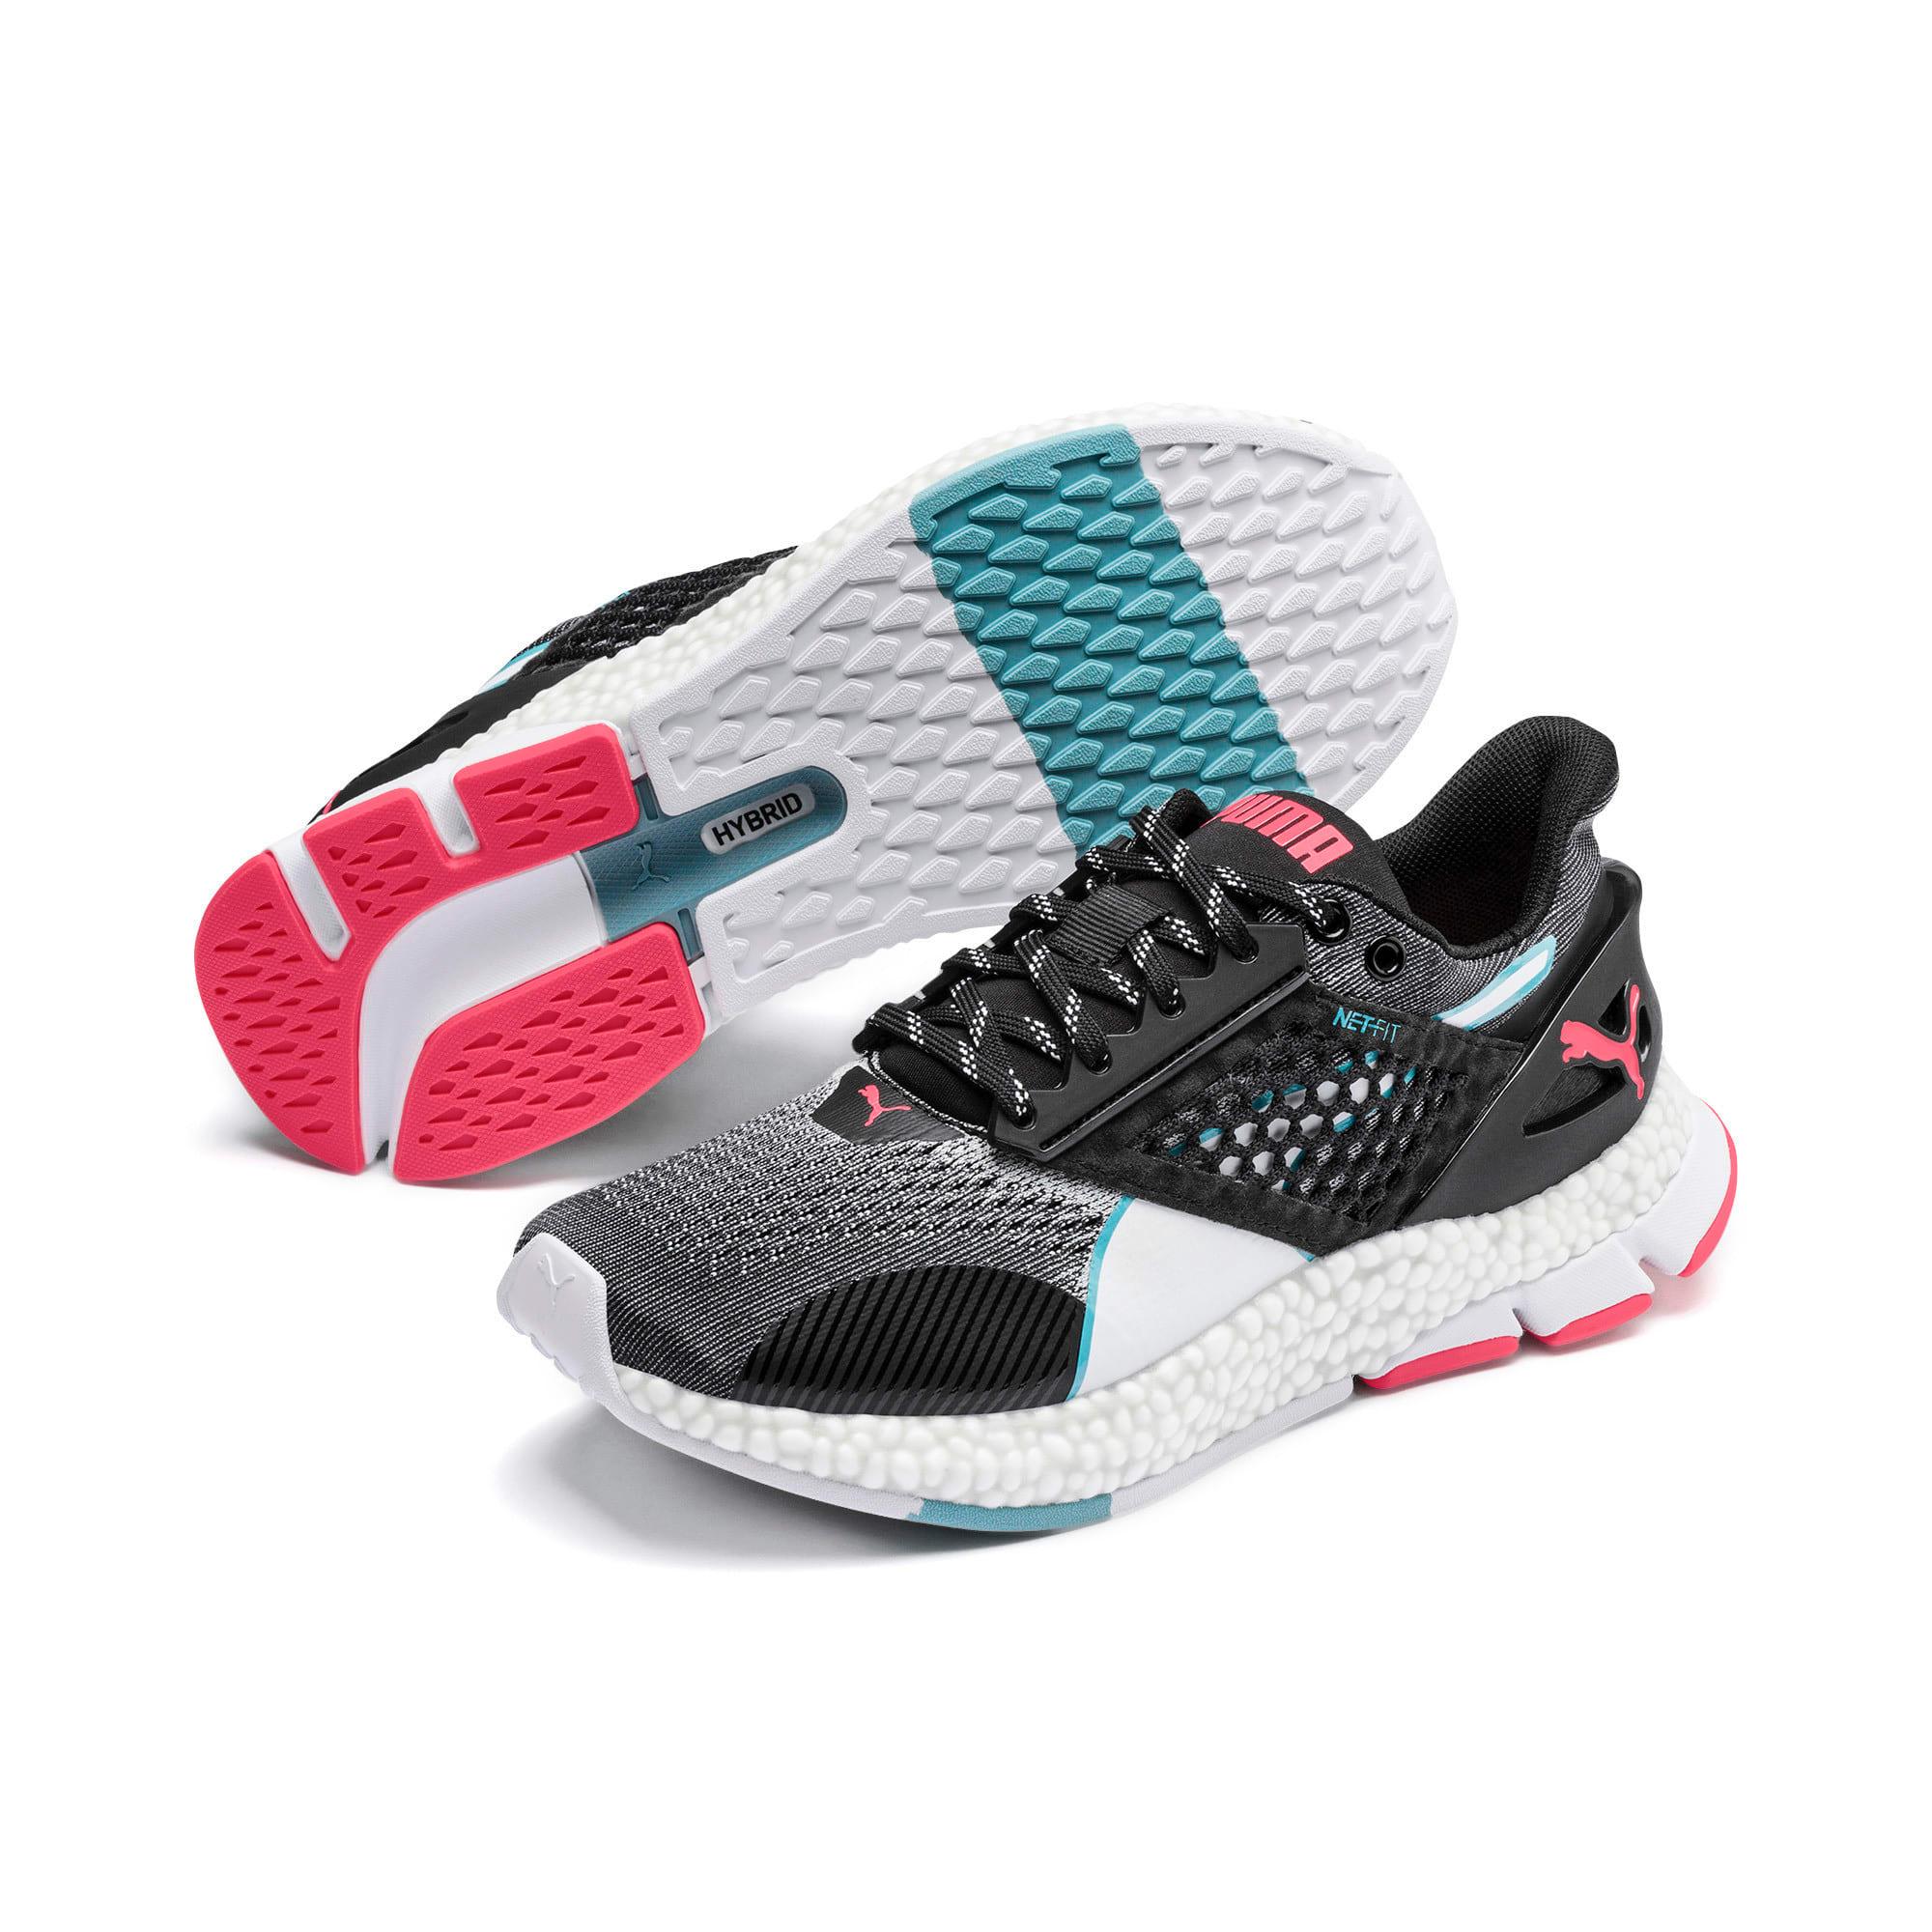 Thumbnail 4 of HYBRID NETFIT Astro Women's Running Shoes, Puma Black-Pink Alert, medium-IND